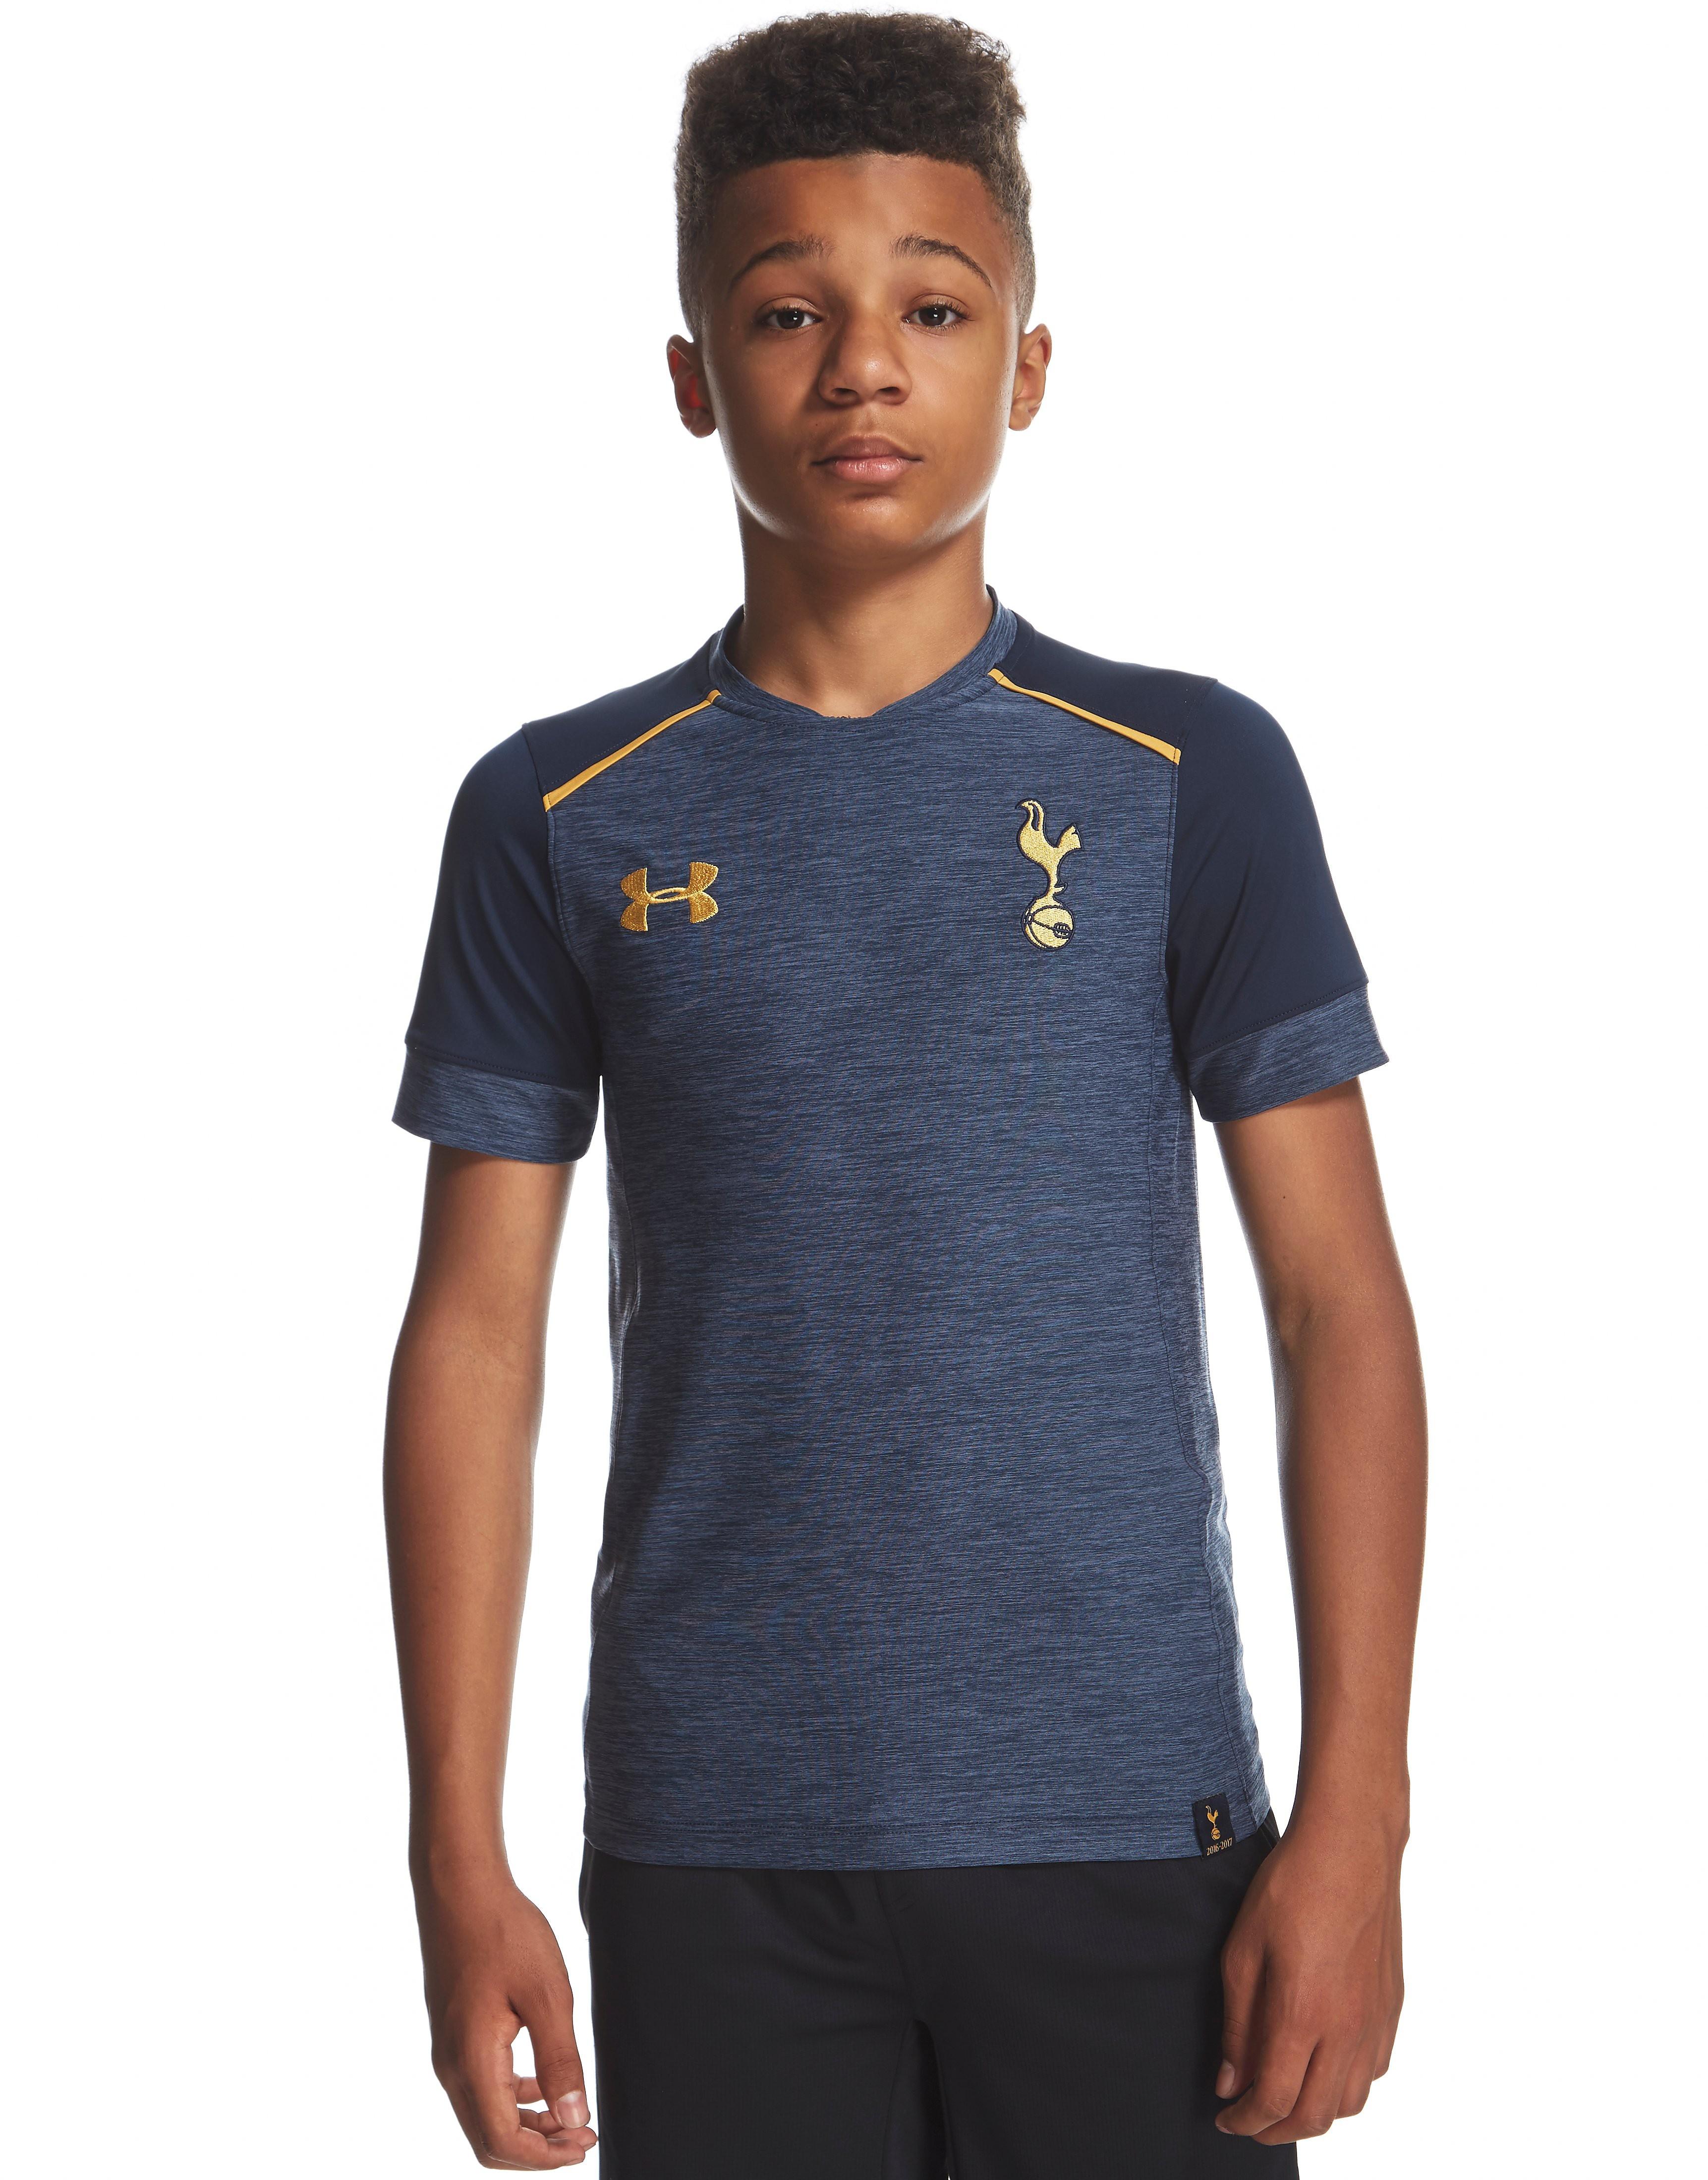 Under Armour Tottenham Hotspur 2016/17 Training Shirt Junior